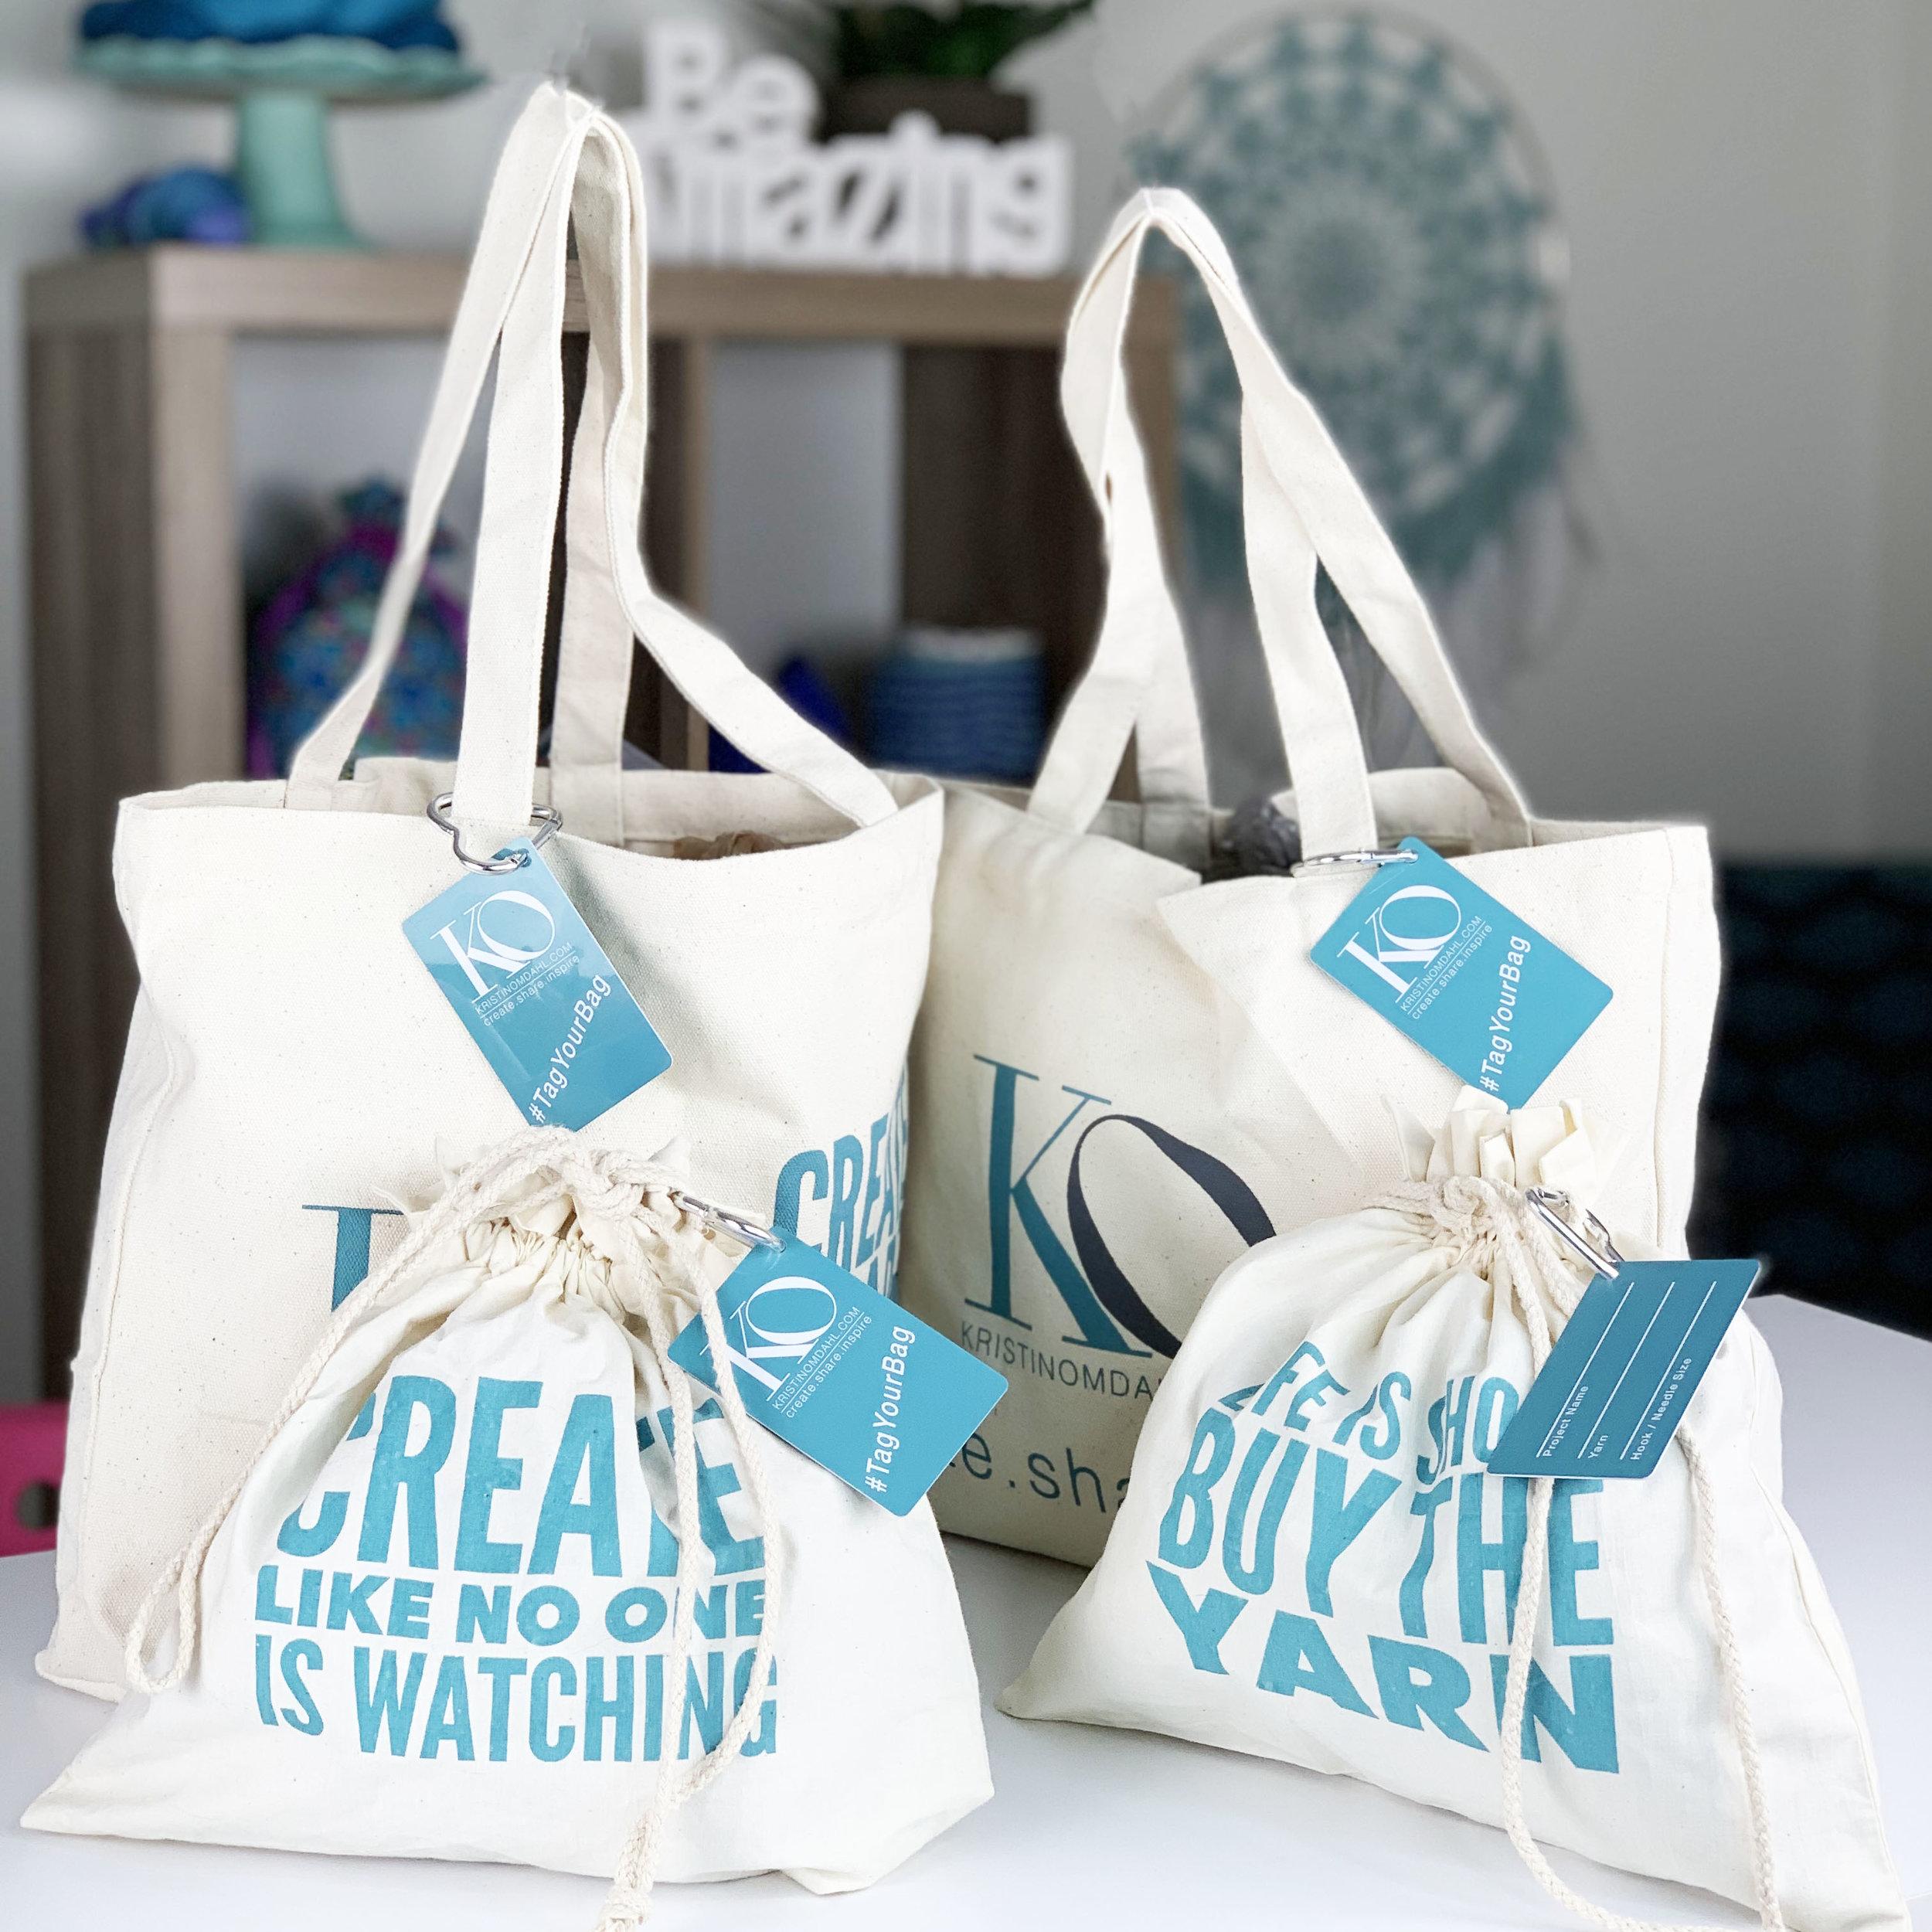 BAG TAGS on bags 2.jpg